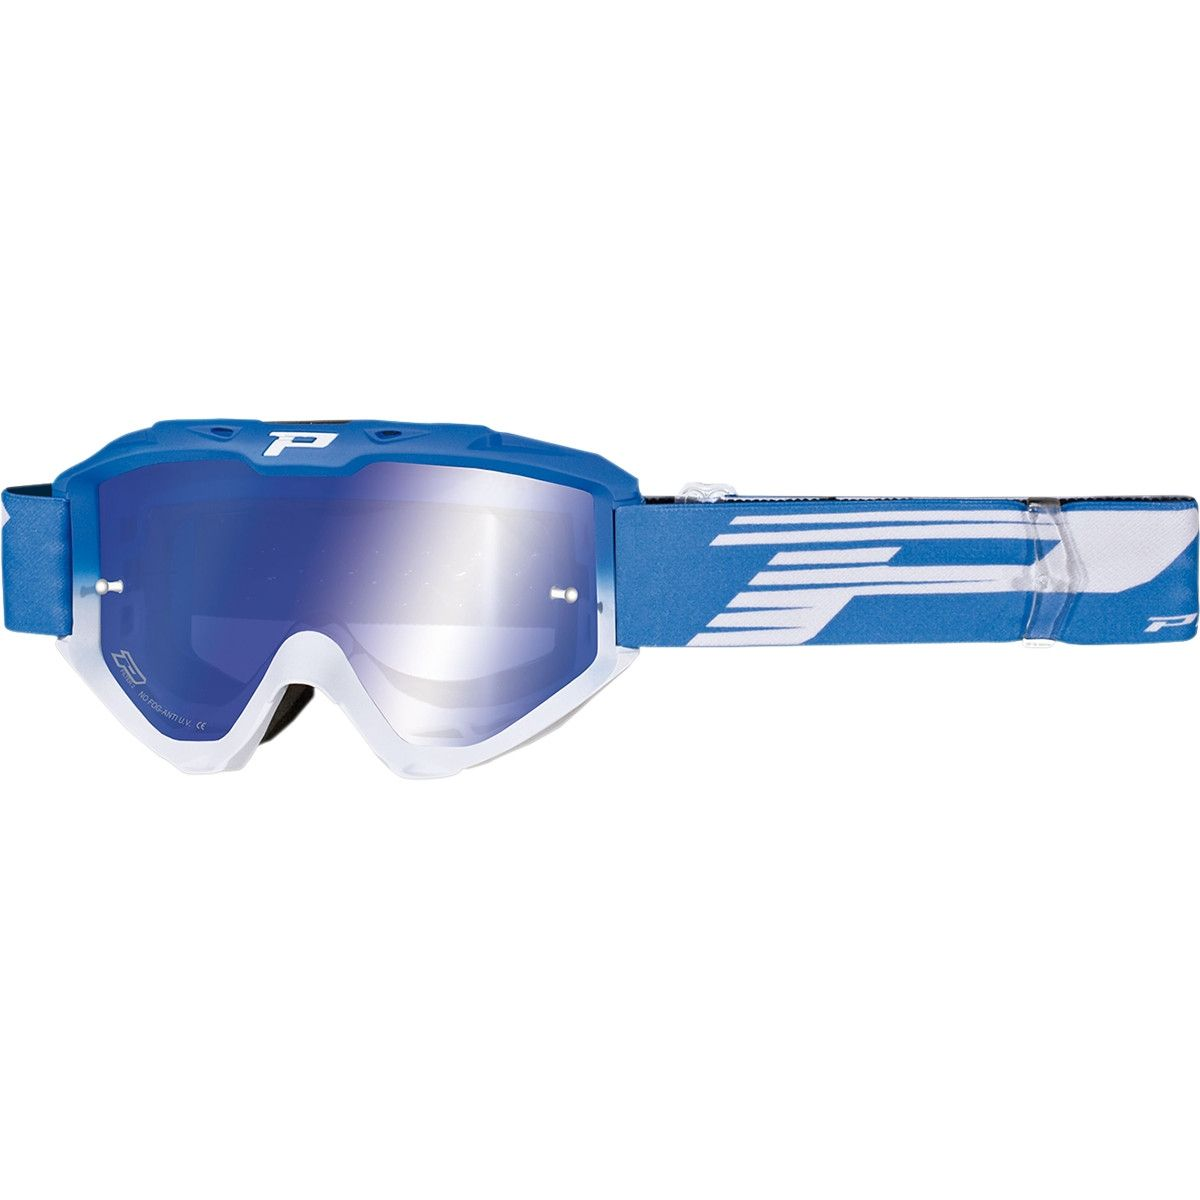 Progrip Crossbril 3450 Riot Mirror Blue/White